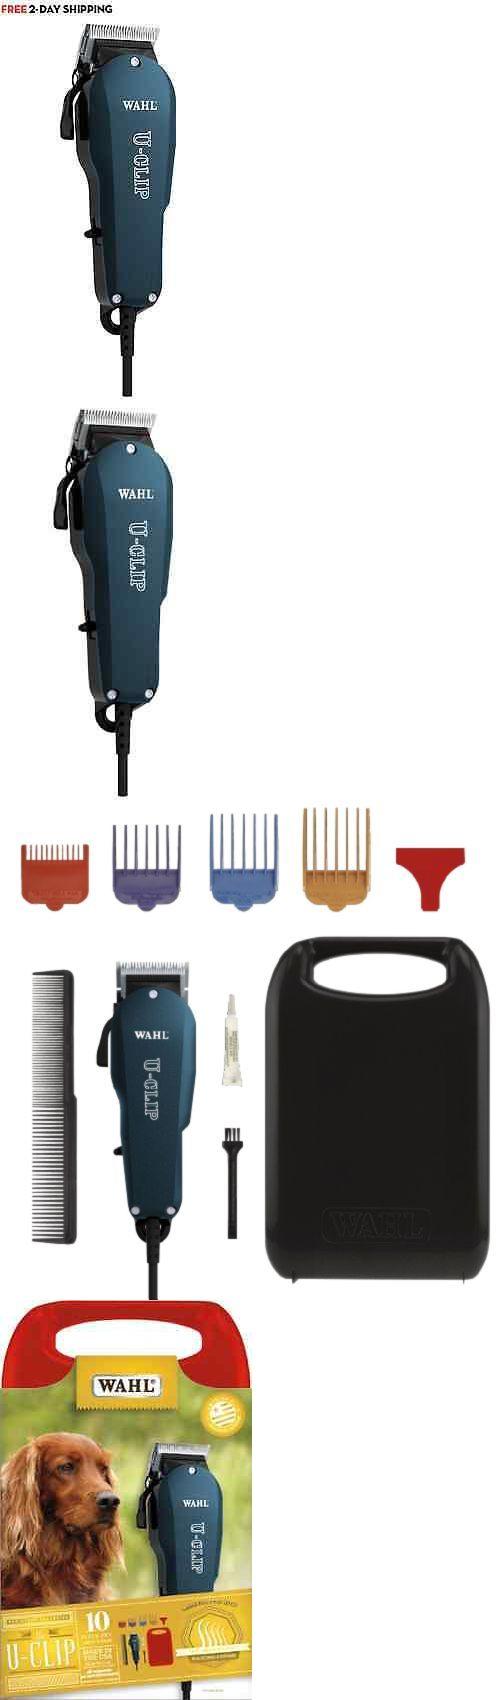 17 best ideas about grooming kit on pinterest beard. Black Bedroom Furniture Sets. Home Design Ideas